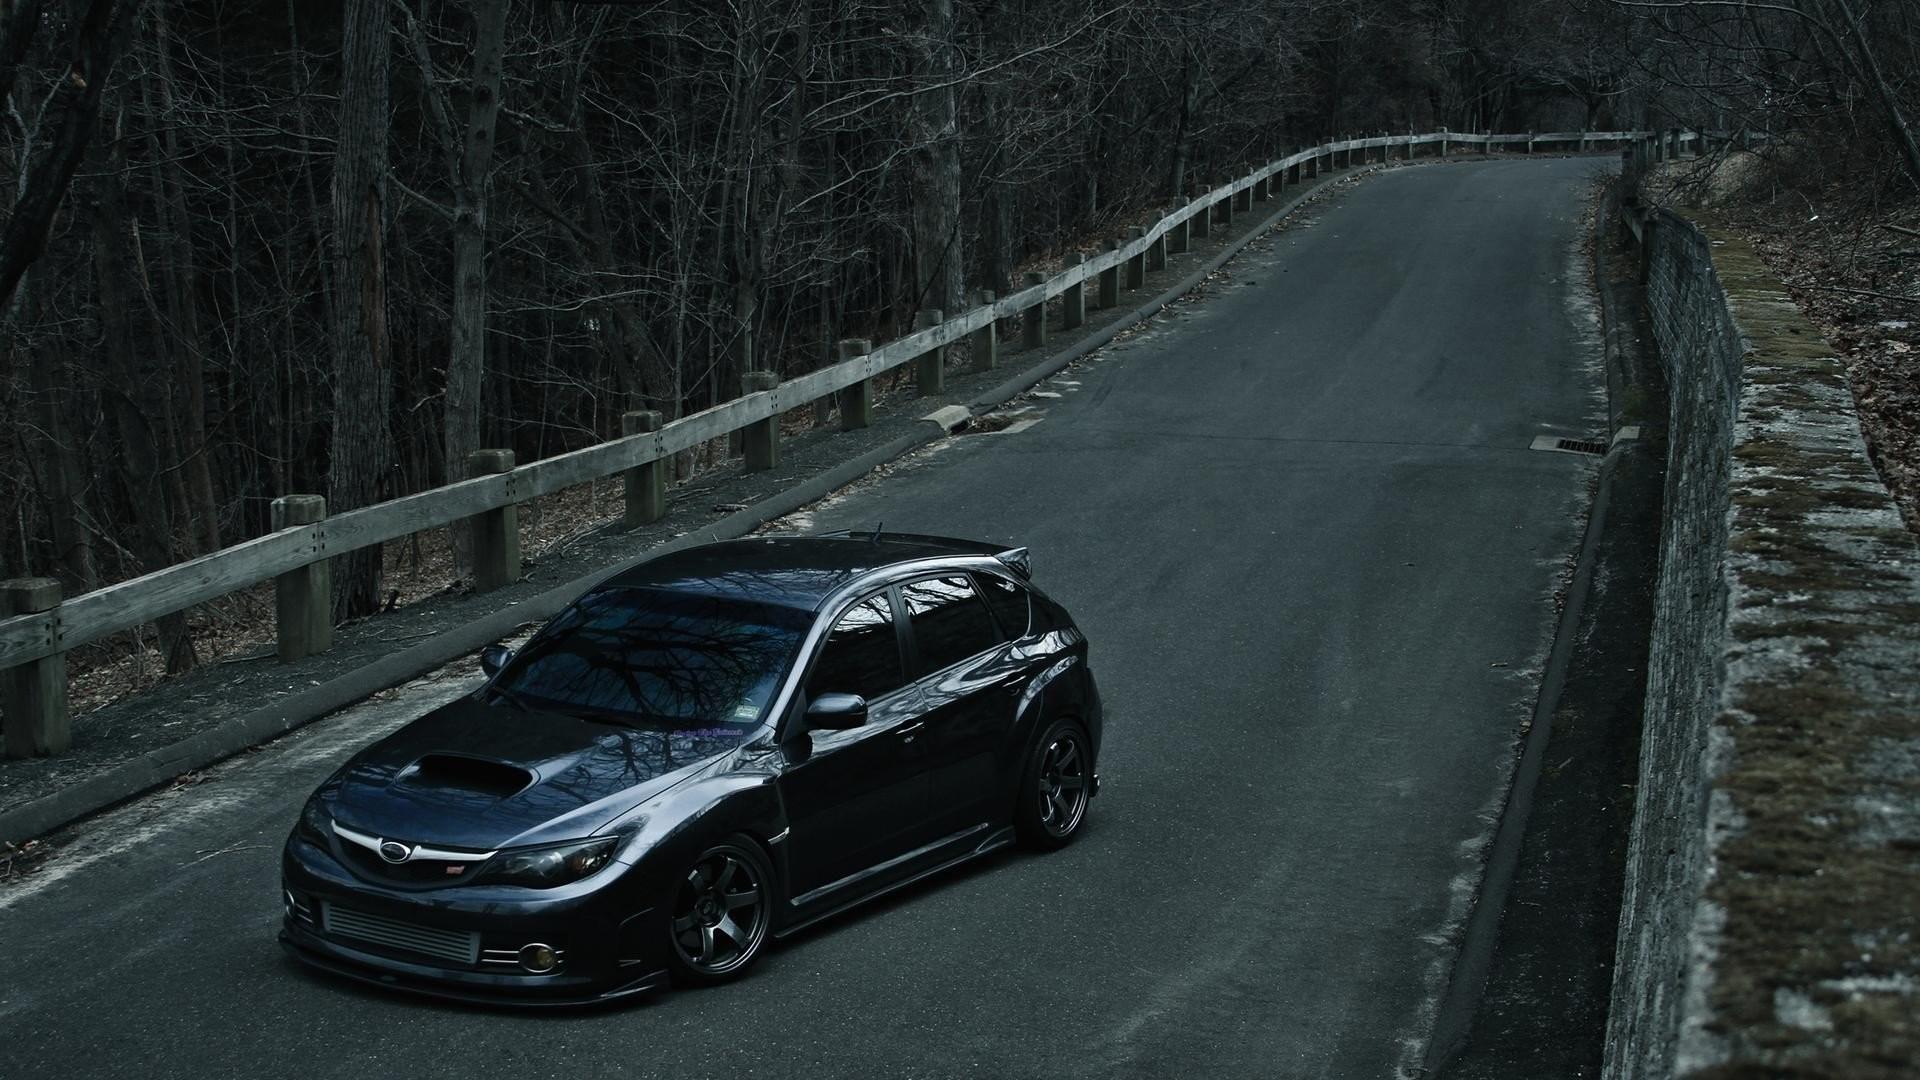 Toyota GT86/Scion FR-S/Subaru BRZ iPhone 6/6 plus wallpaper | Cars iPhone  wallpapers | Pinterest | Scion, Subaru and Toyota